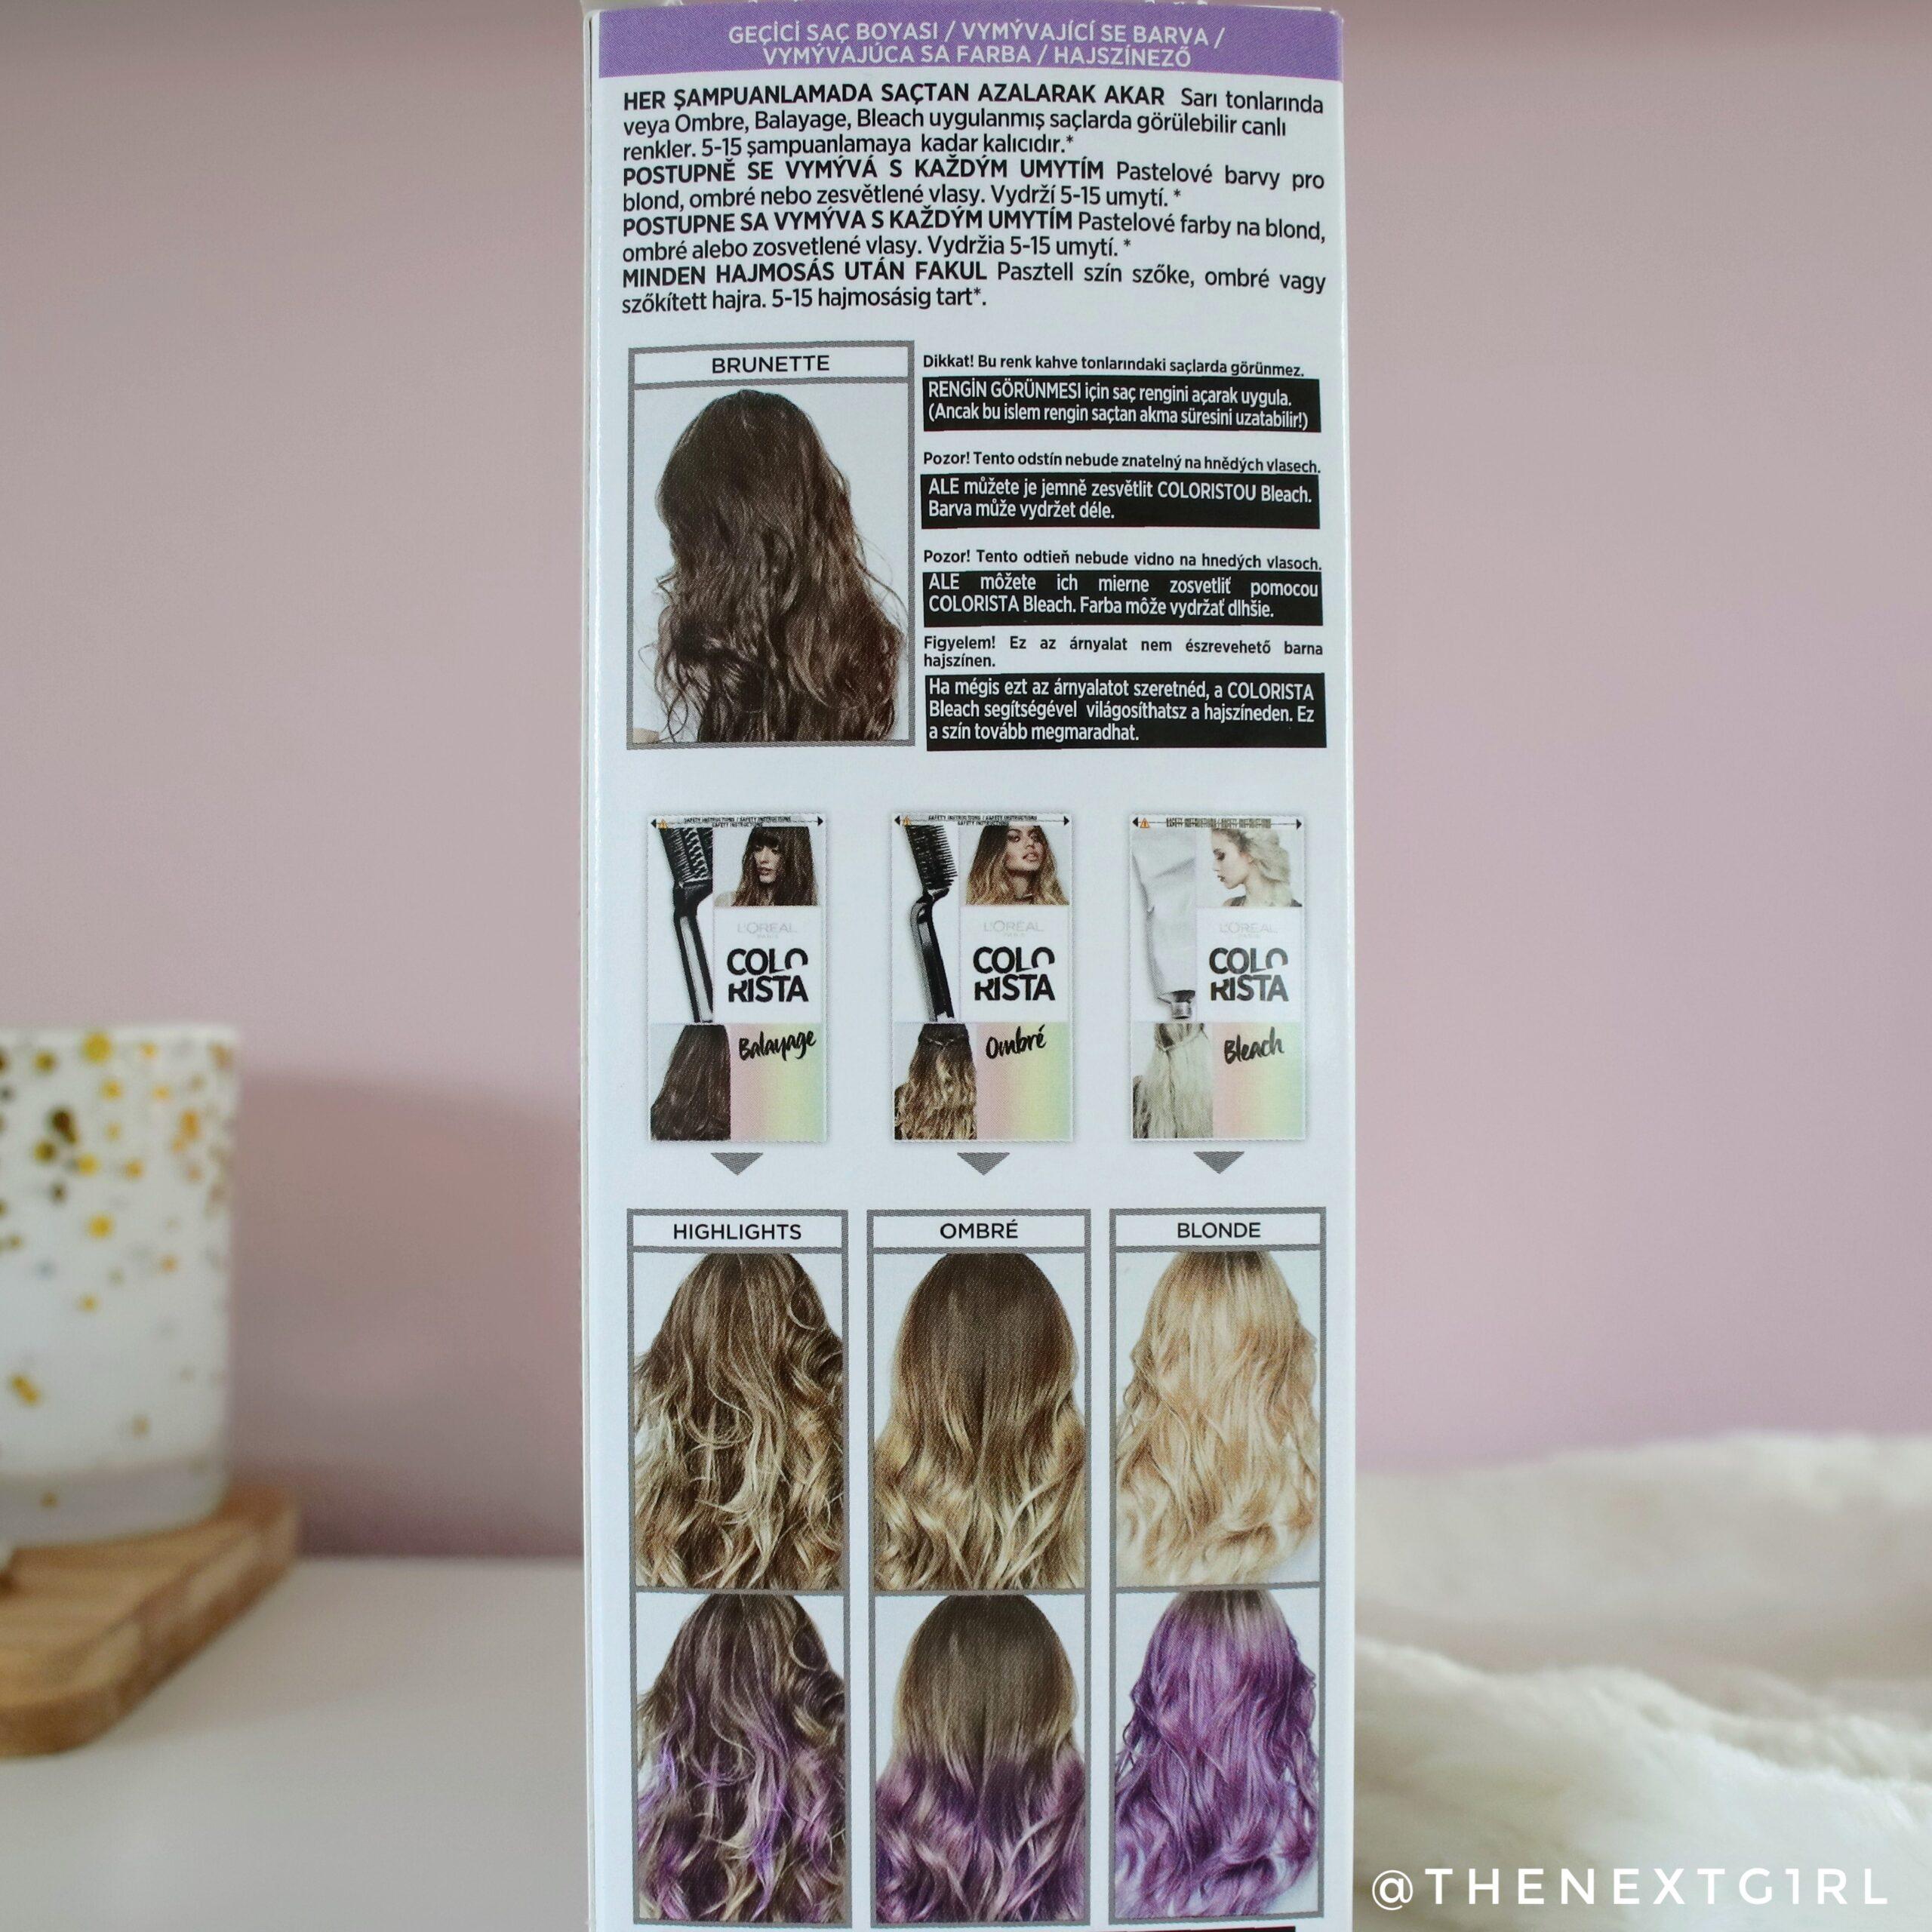 L'Oreal Colorista Washout verpakking